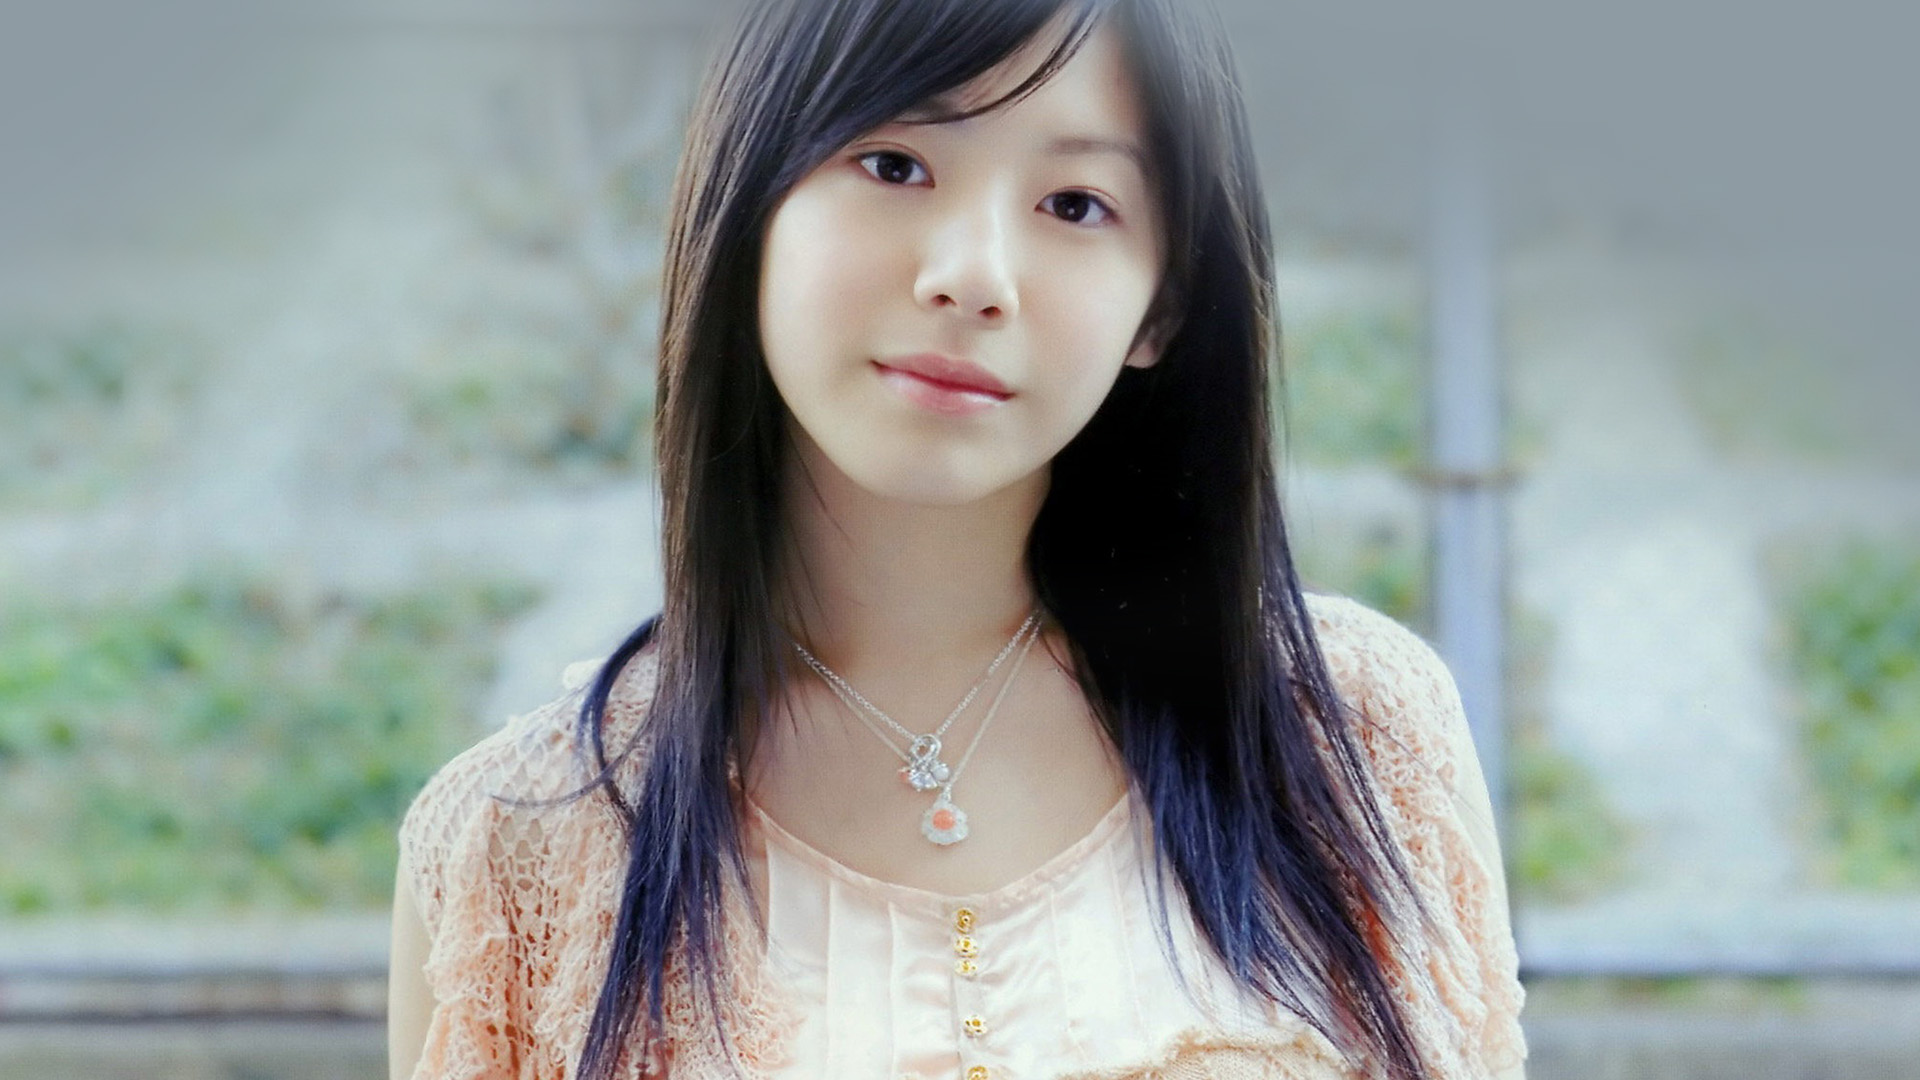 Hj07 Kaho Japanese Girl Actress Wallpaper